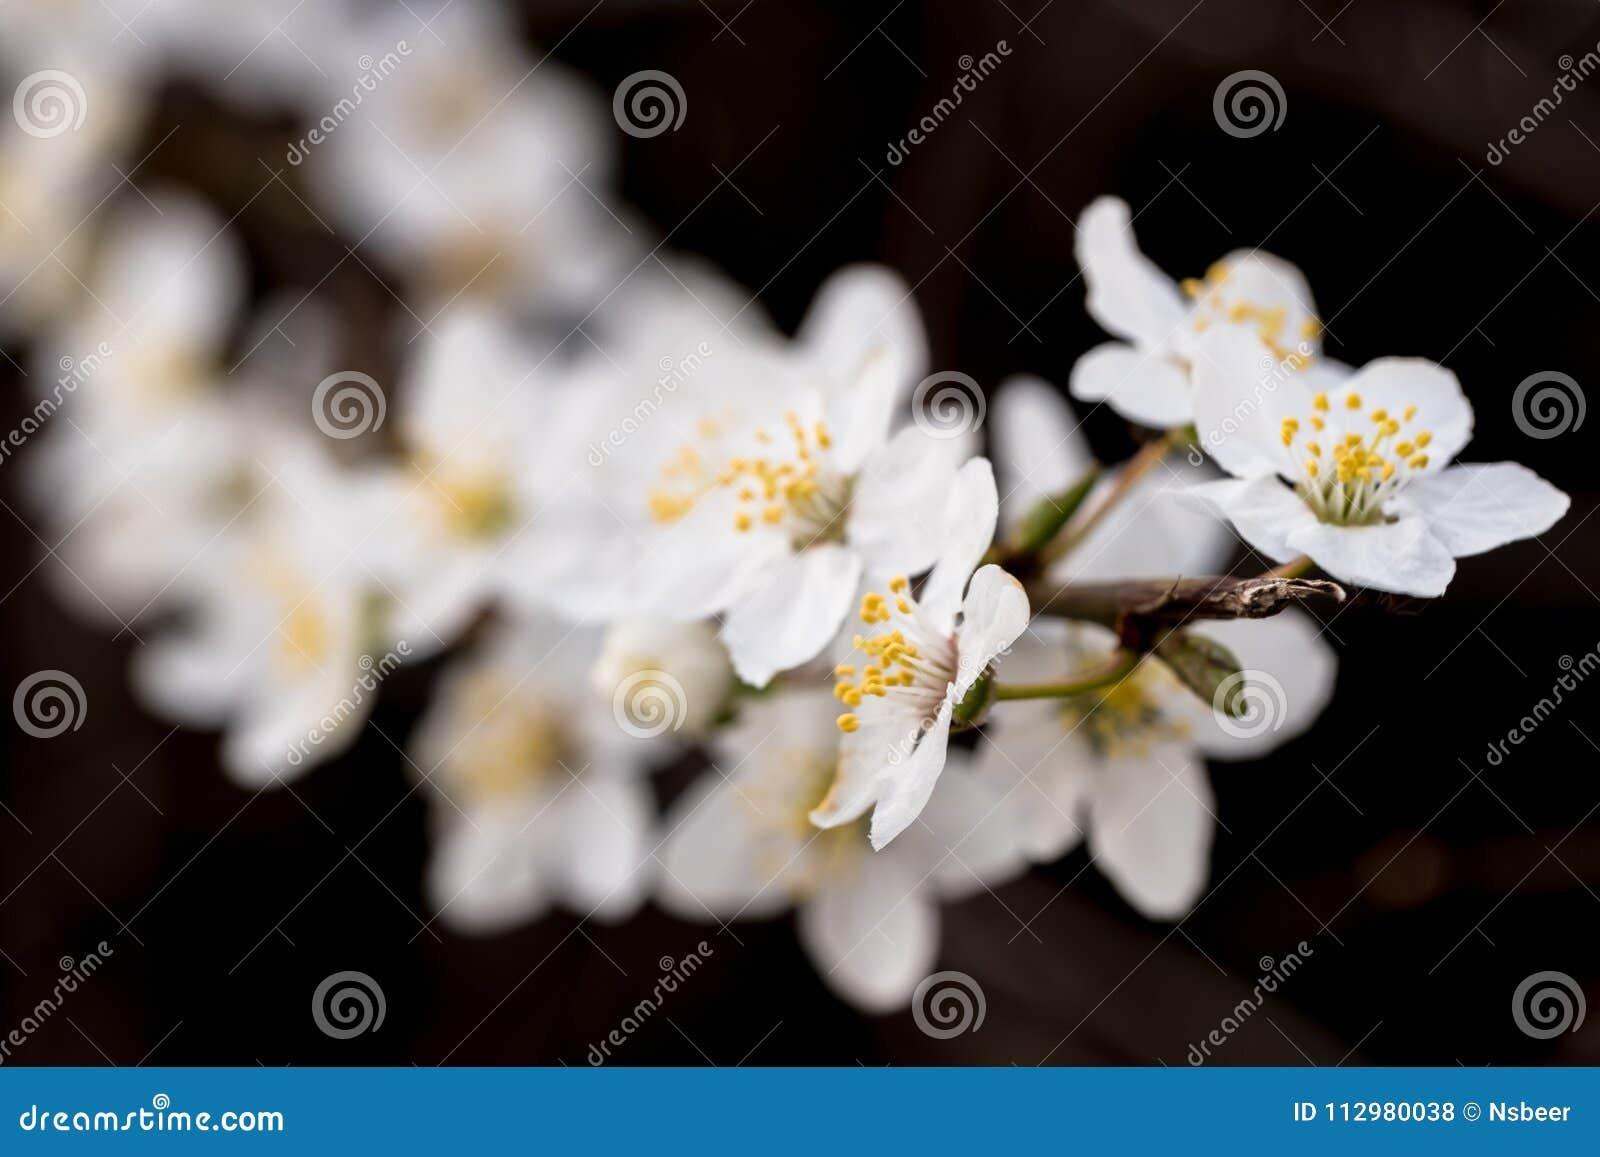 Macro image of springtime crab apple blossom.